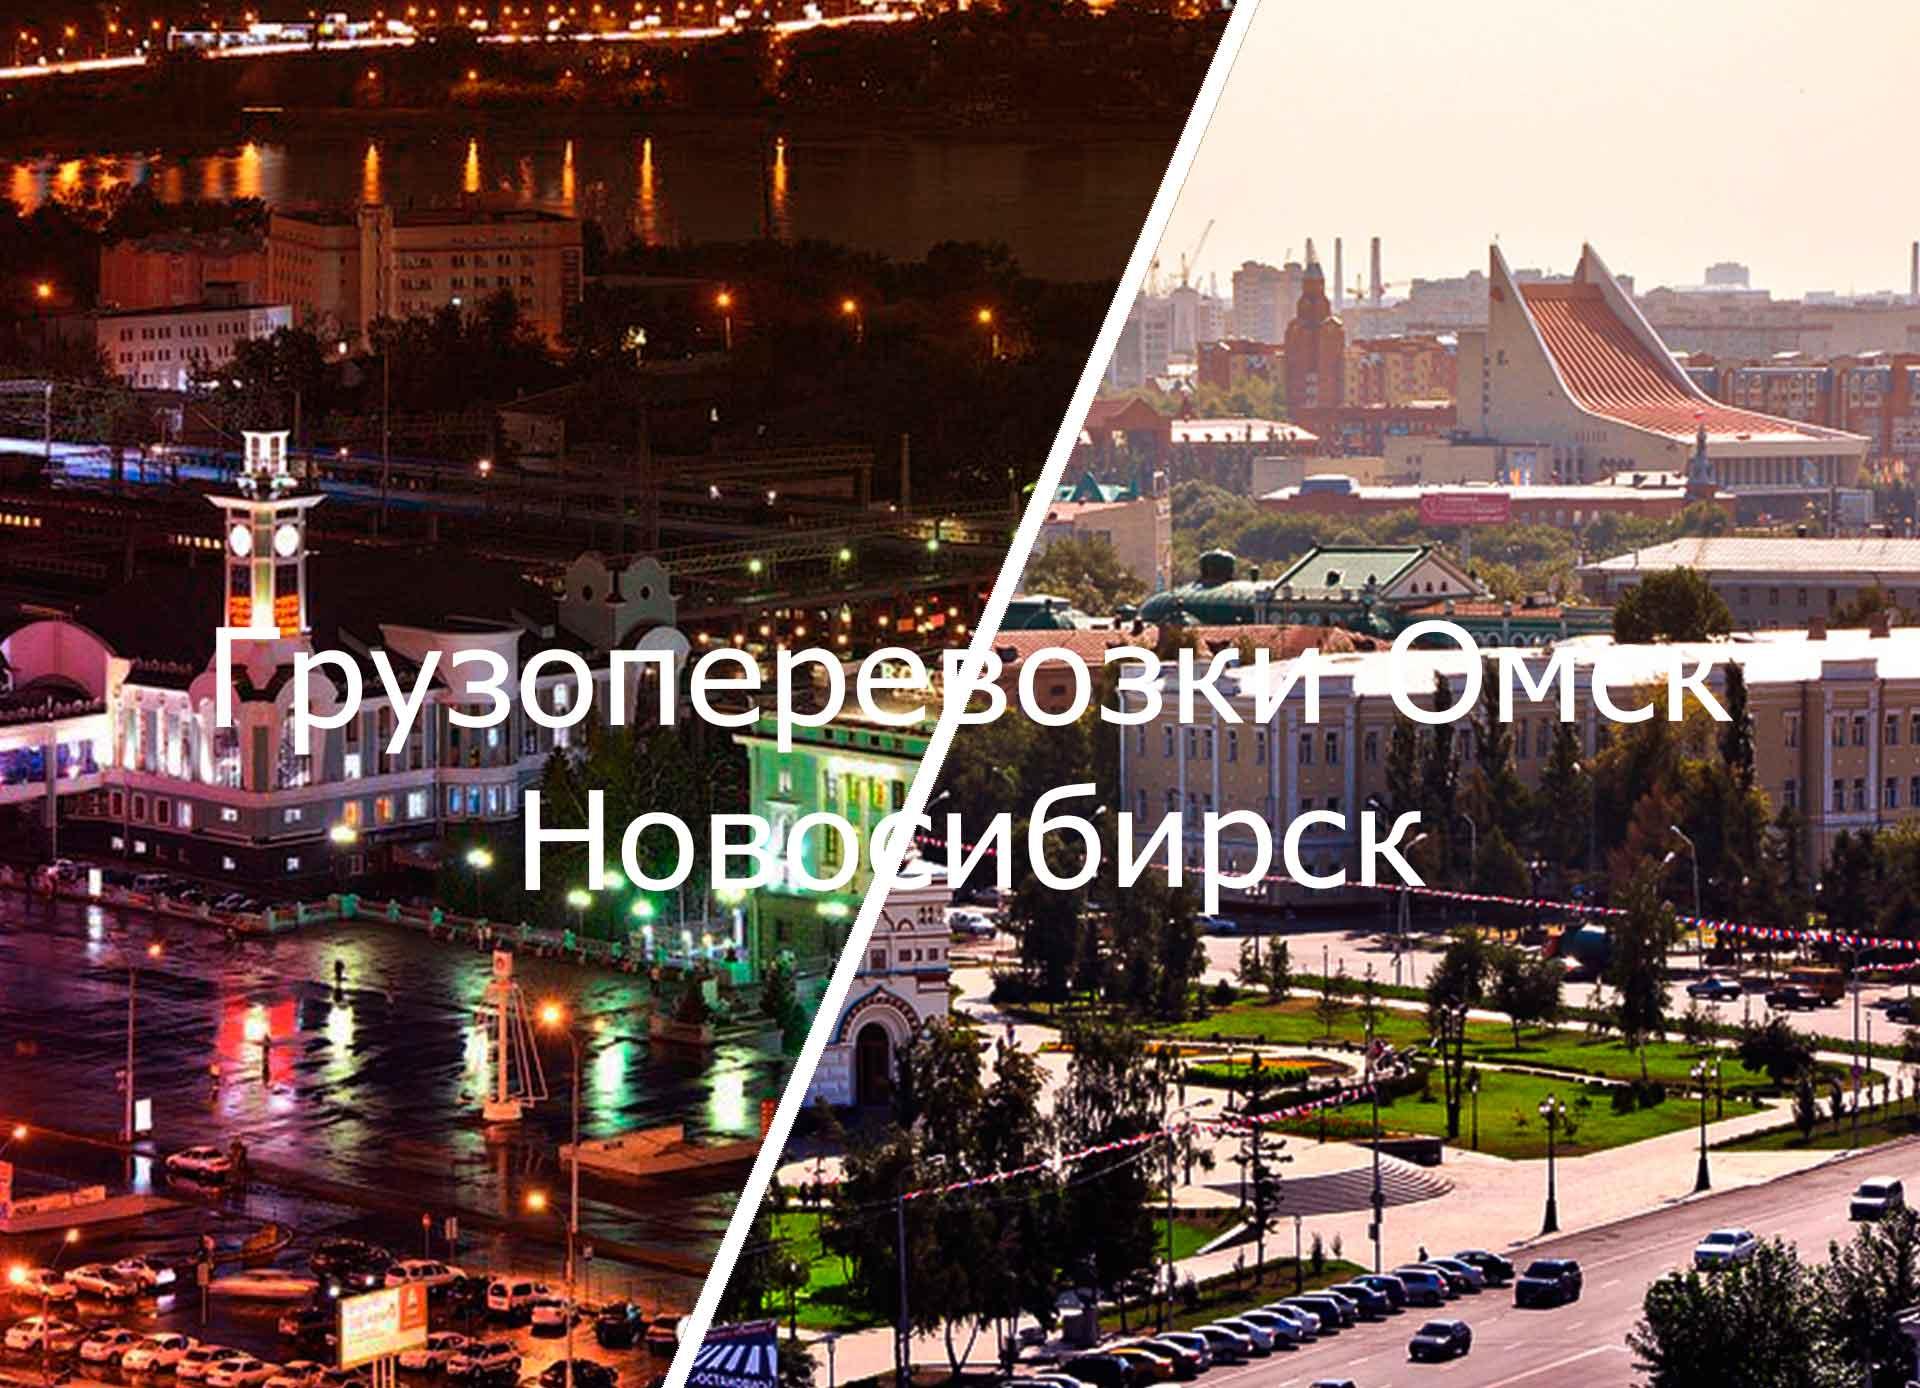 грузоперевозки омск новосибирск